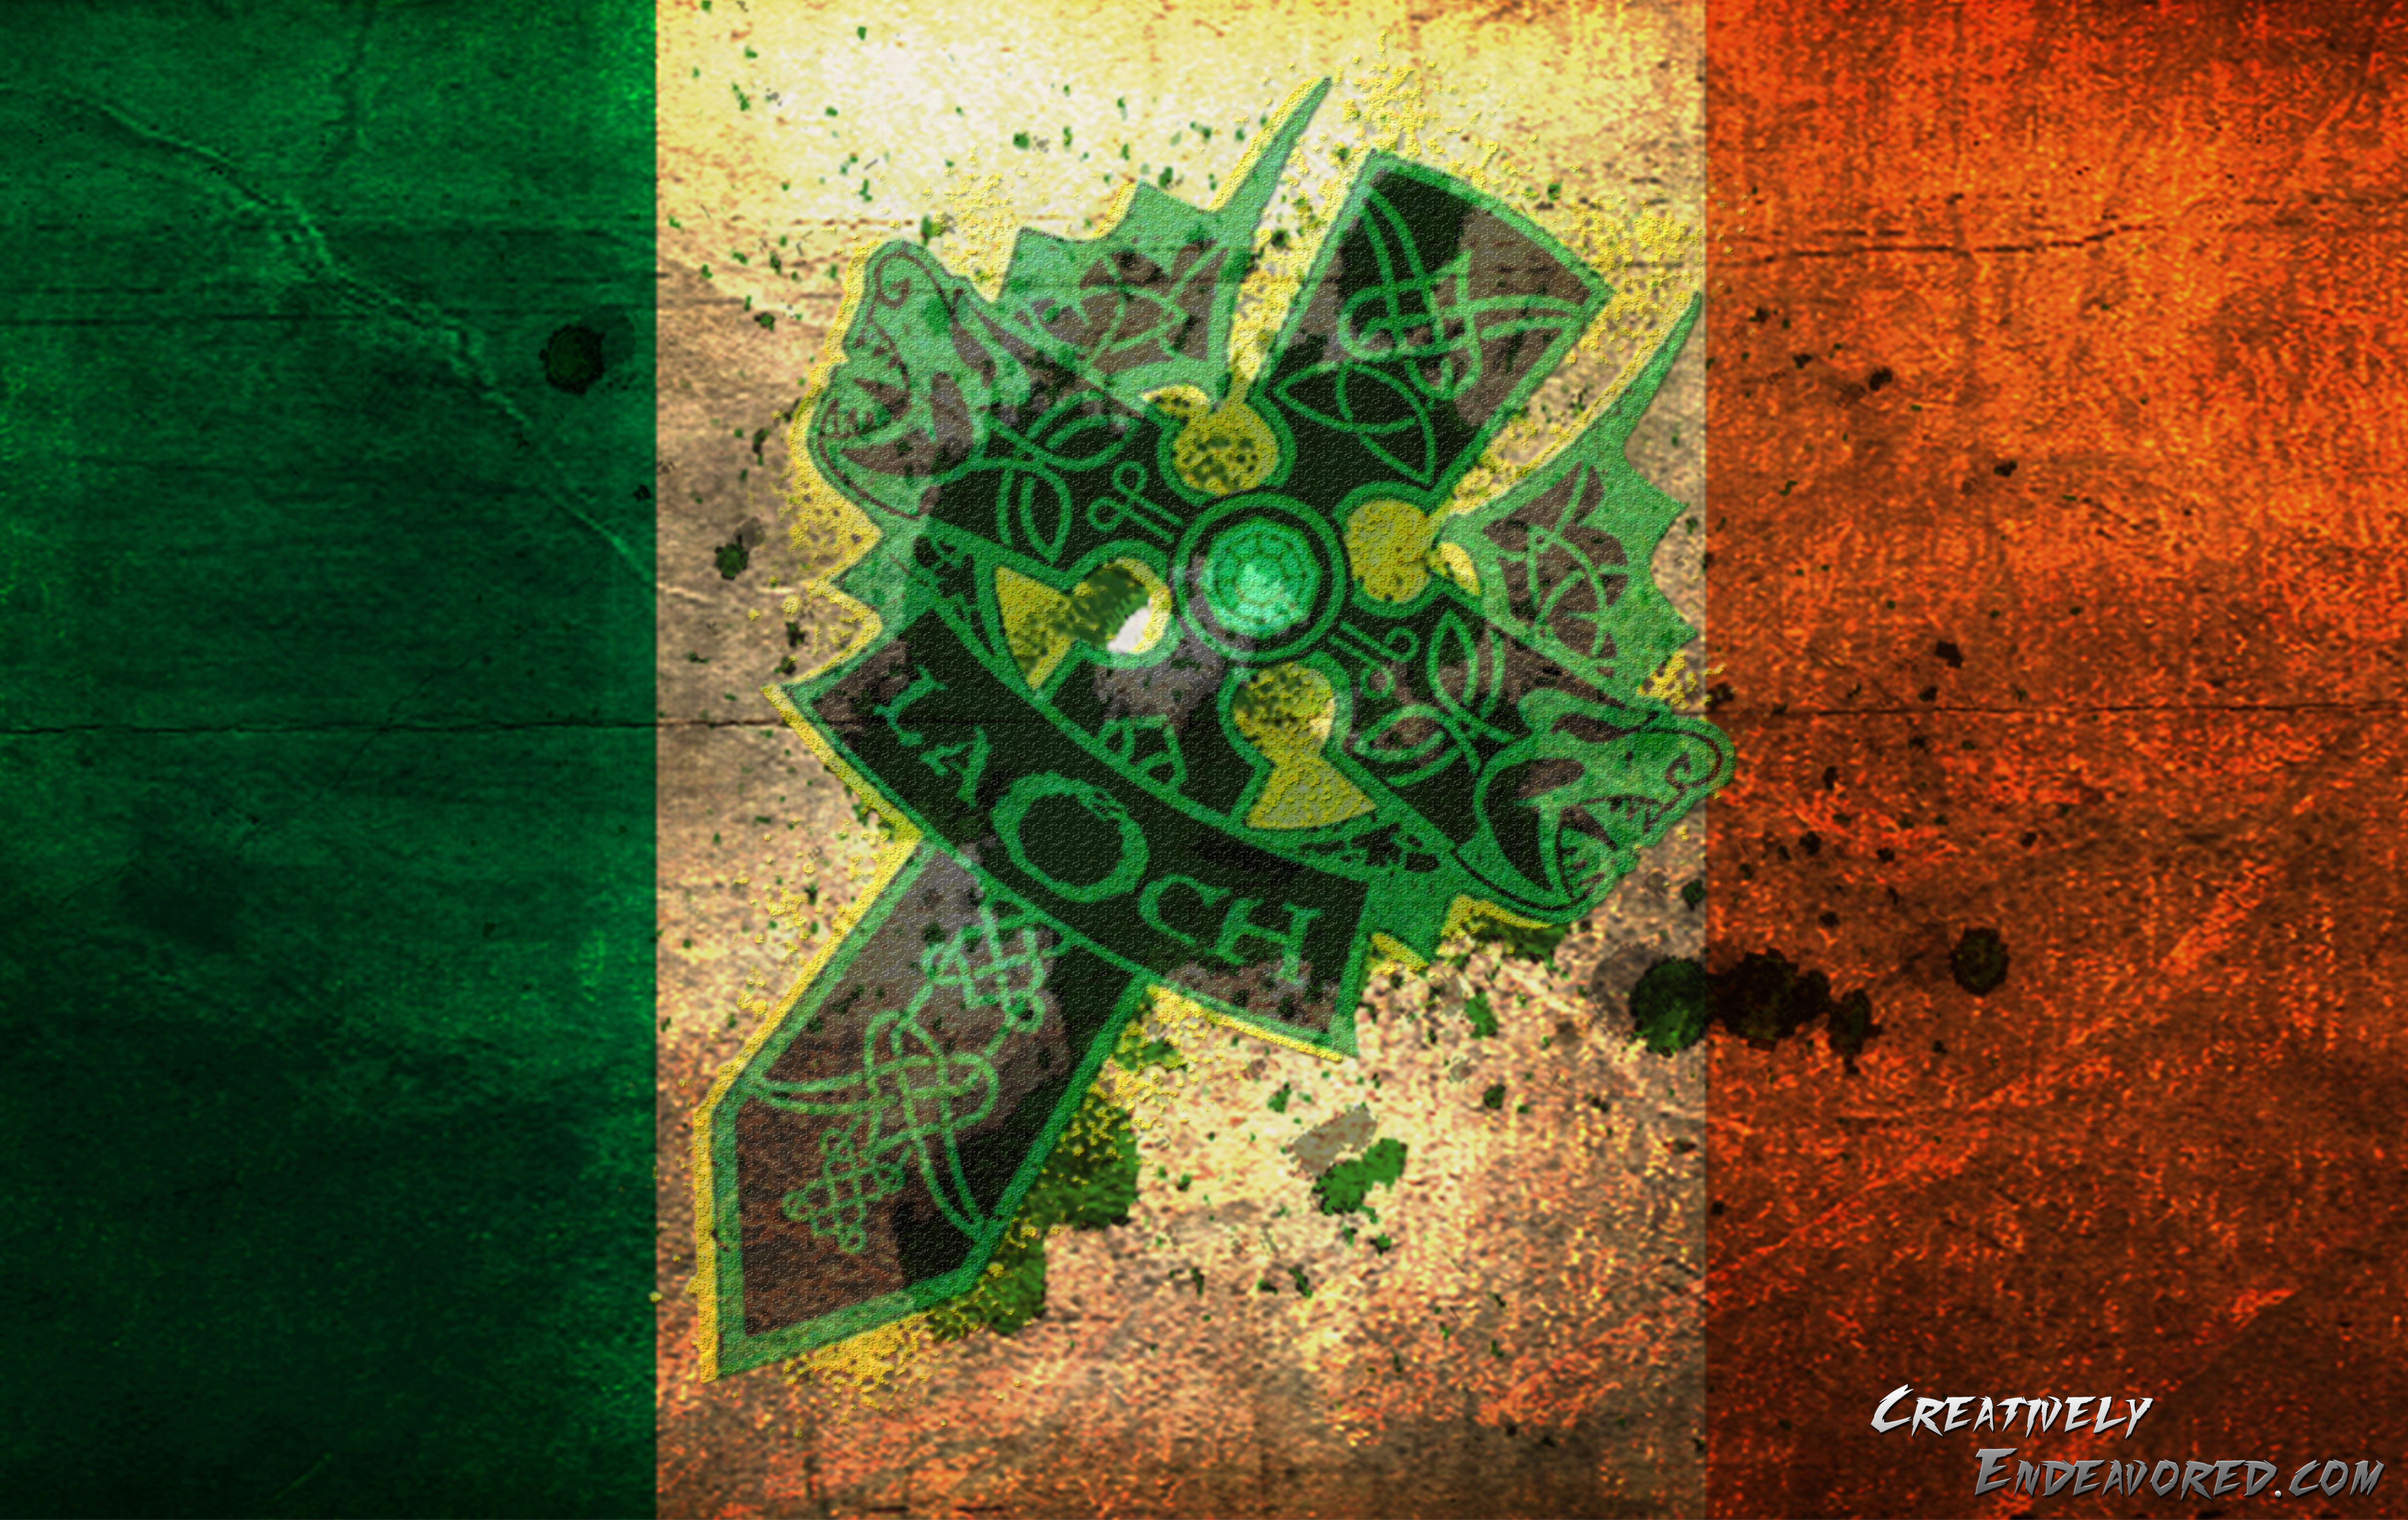 Http://creativelyendeavored.files.wordpress.com/2011/09